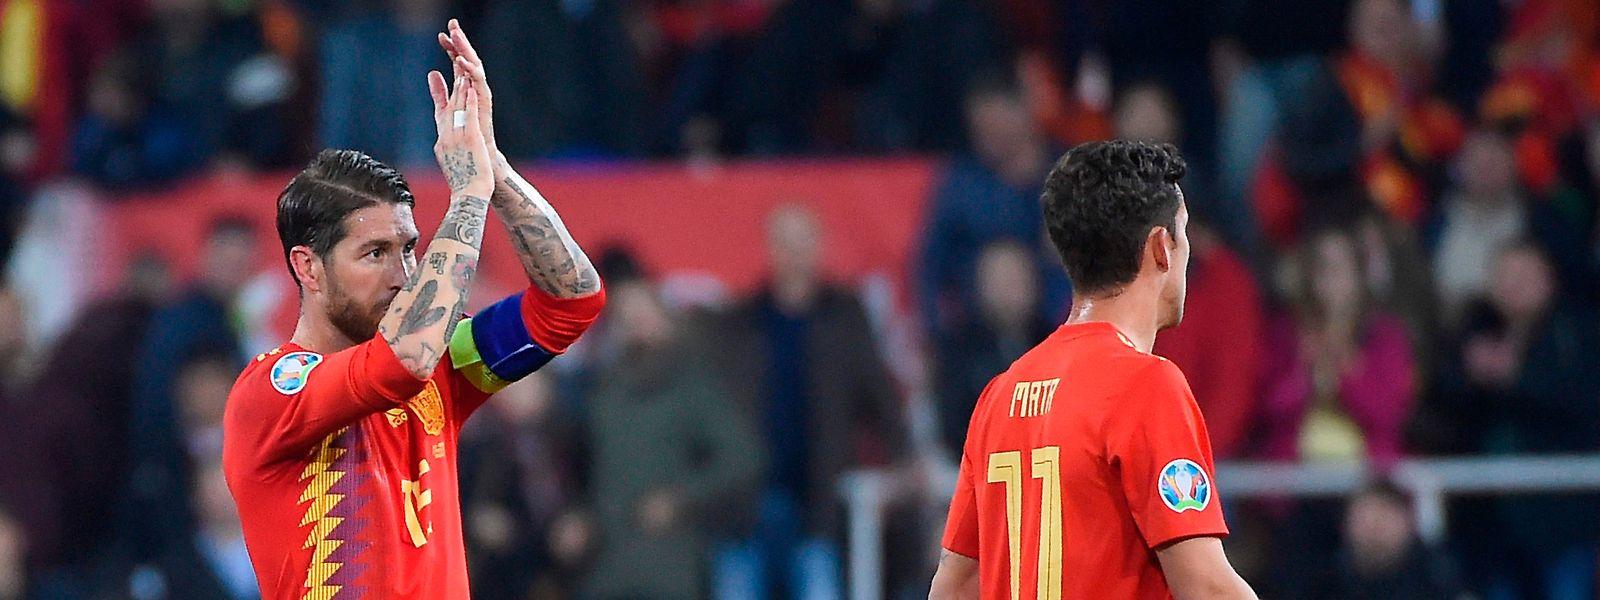 Une panenka de Sergio Ramos a donné la victoire à la Roja.